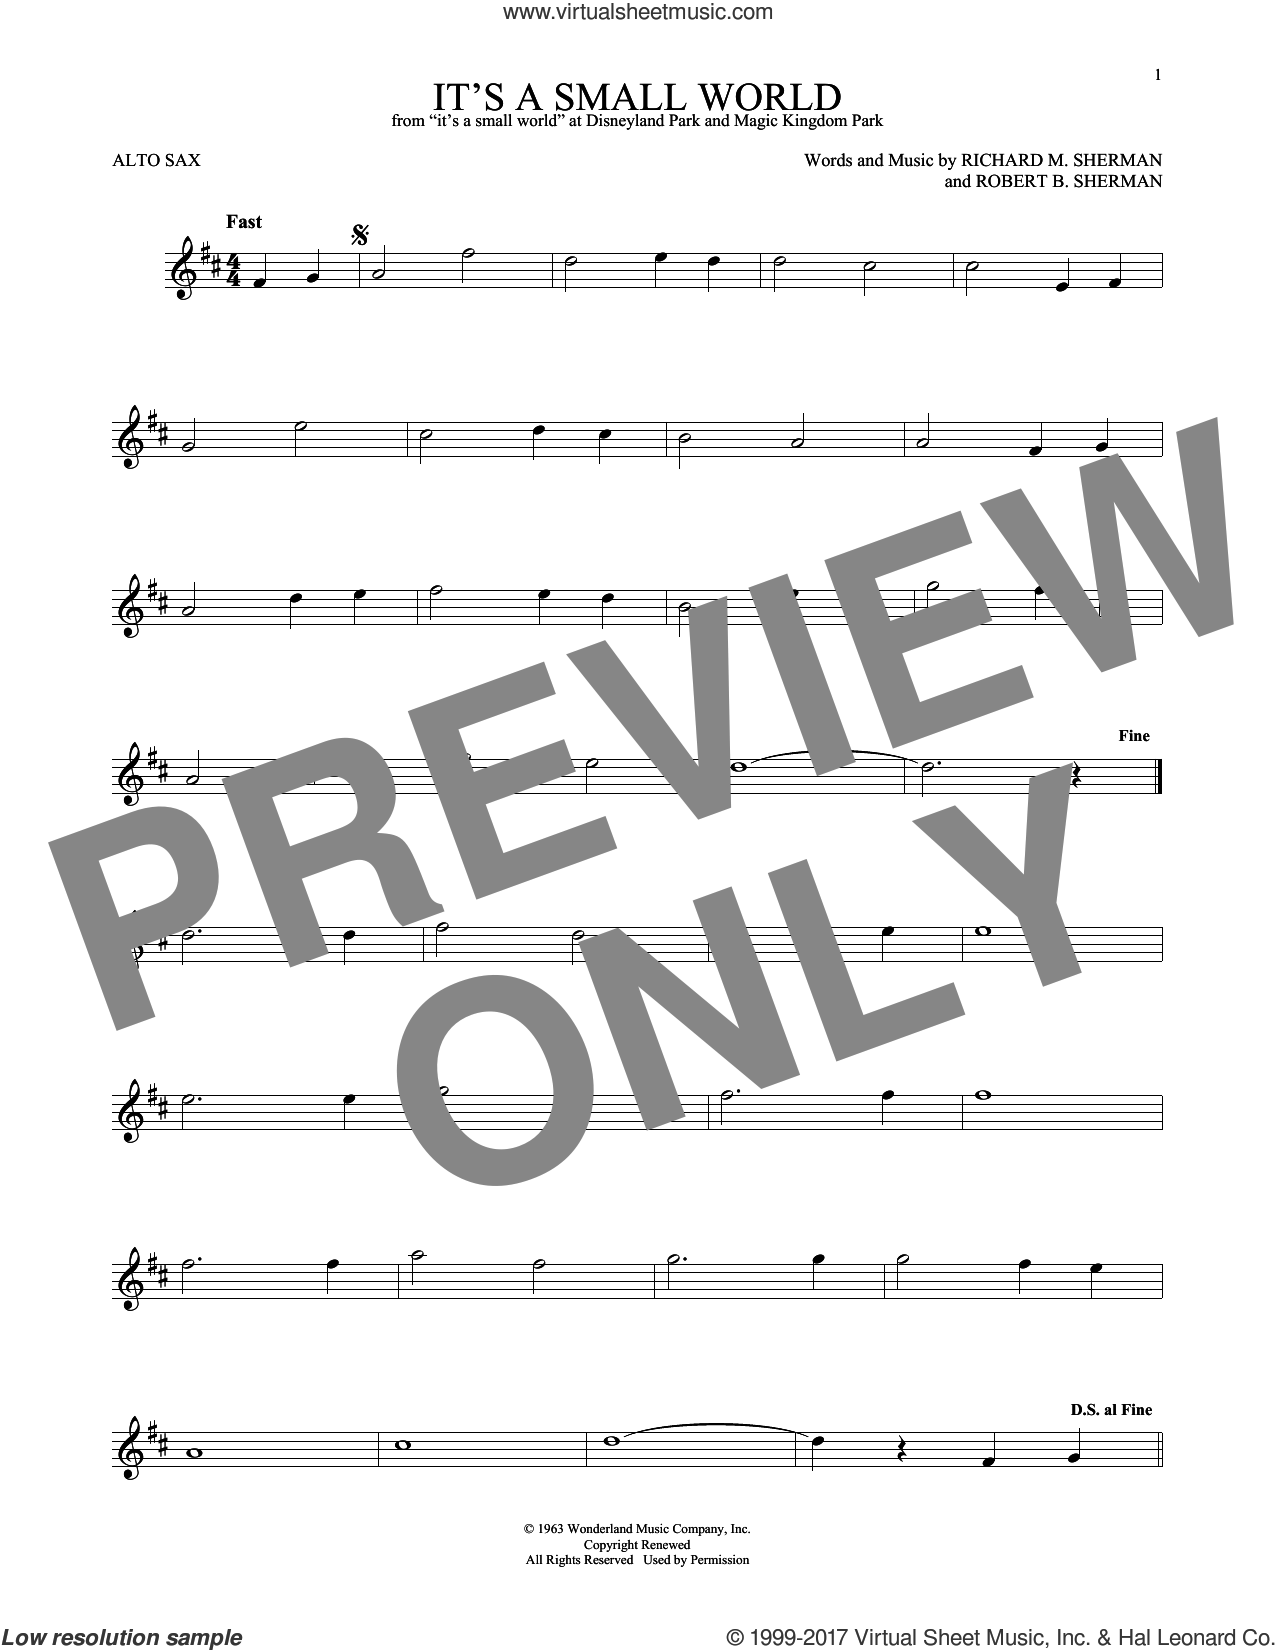 It's A Small World sheet music for alto saxophone solo by Richard M. Sherman and Robert B. Sherman, intermediate skill level